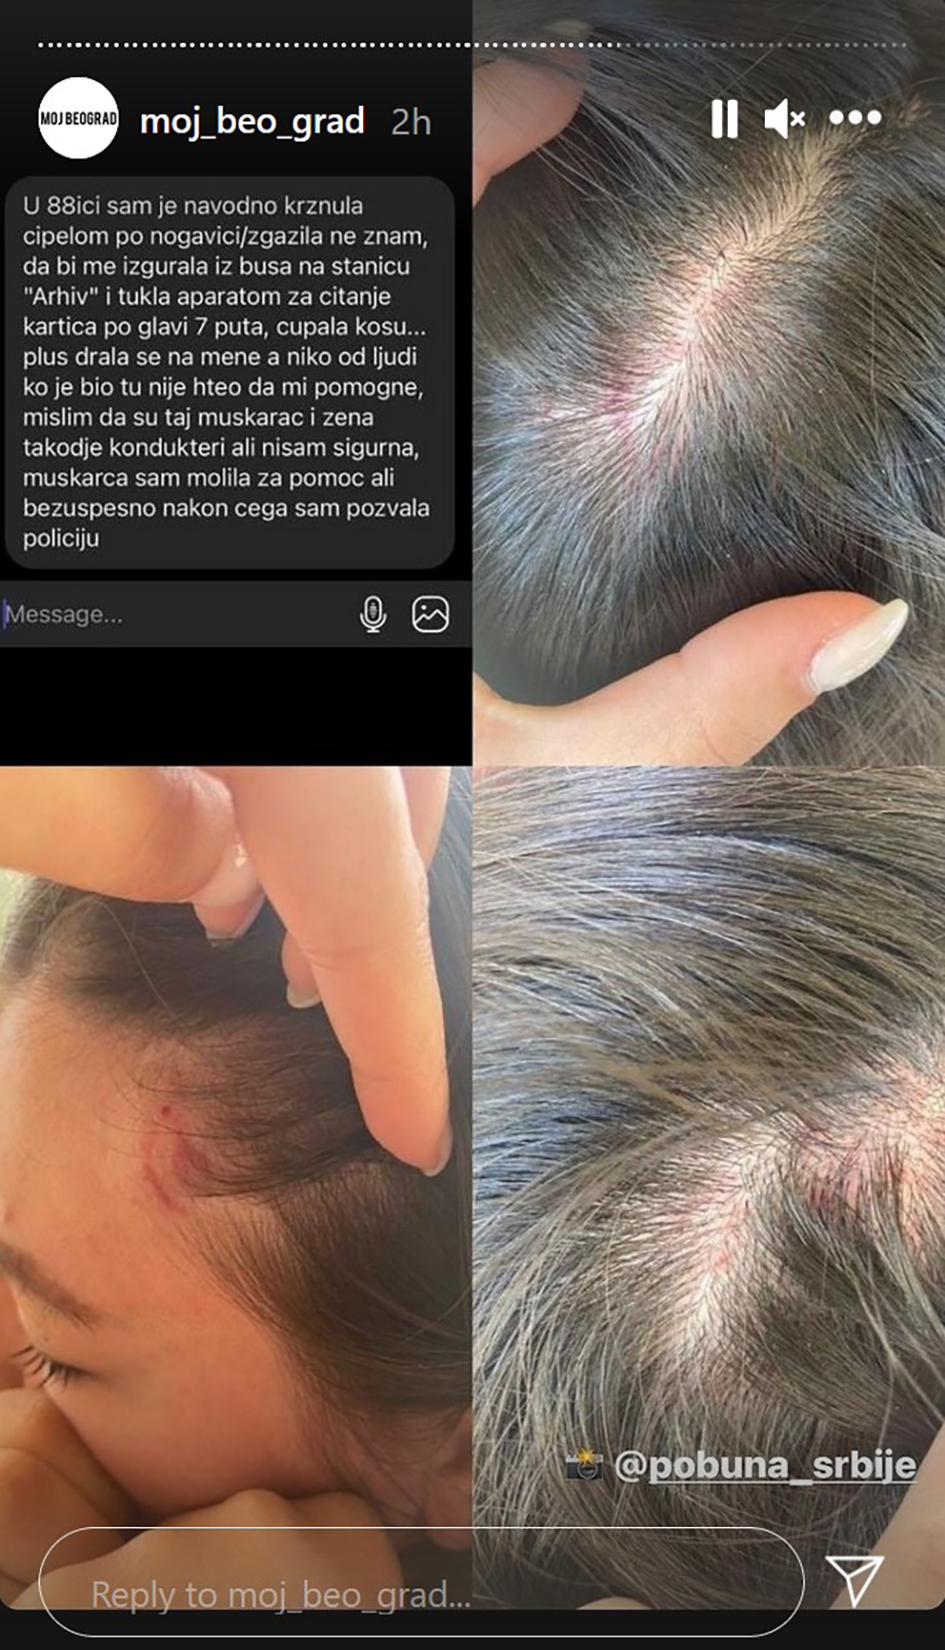 Povrede Foto: Printscreen/Instagram story/moj_beo_grad/@pobuna_srbije